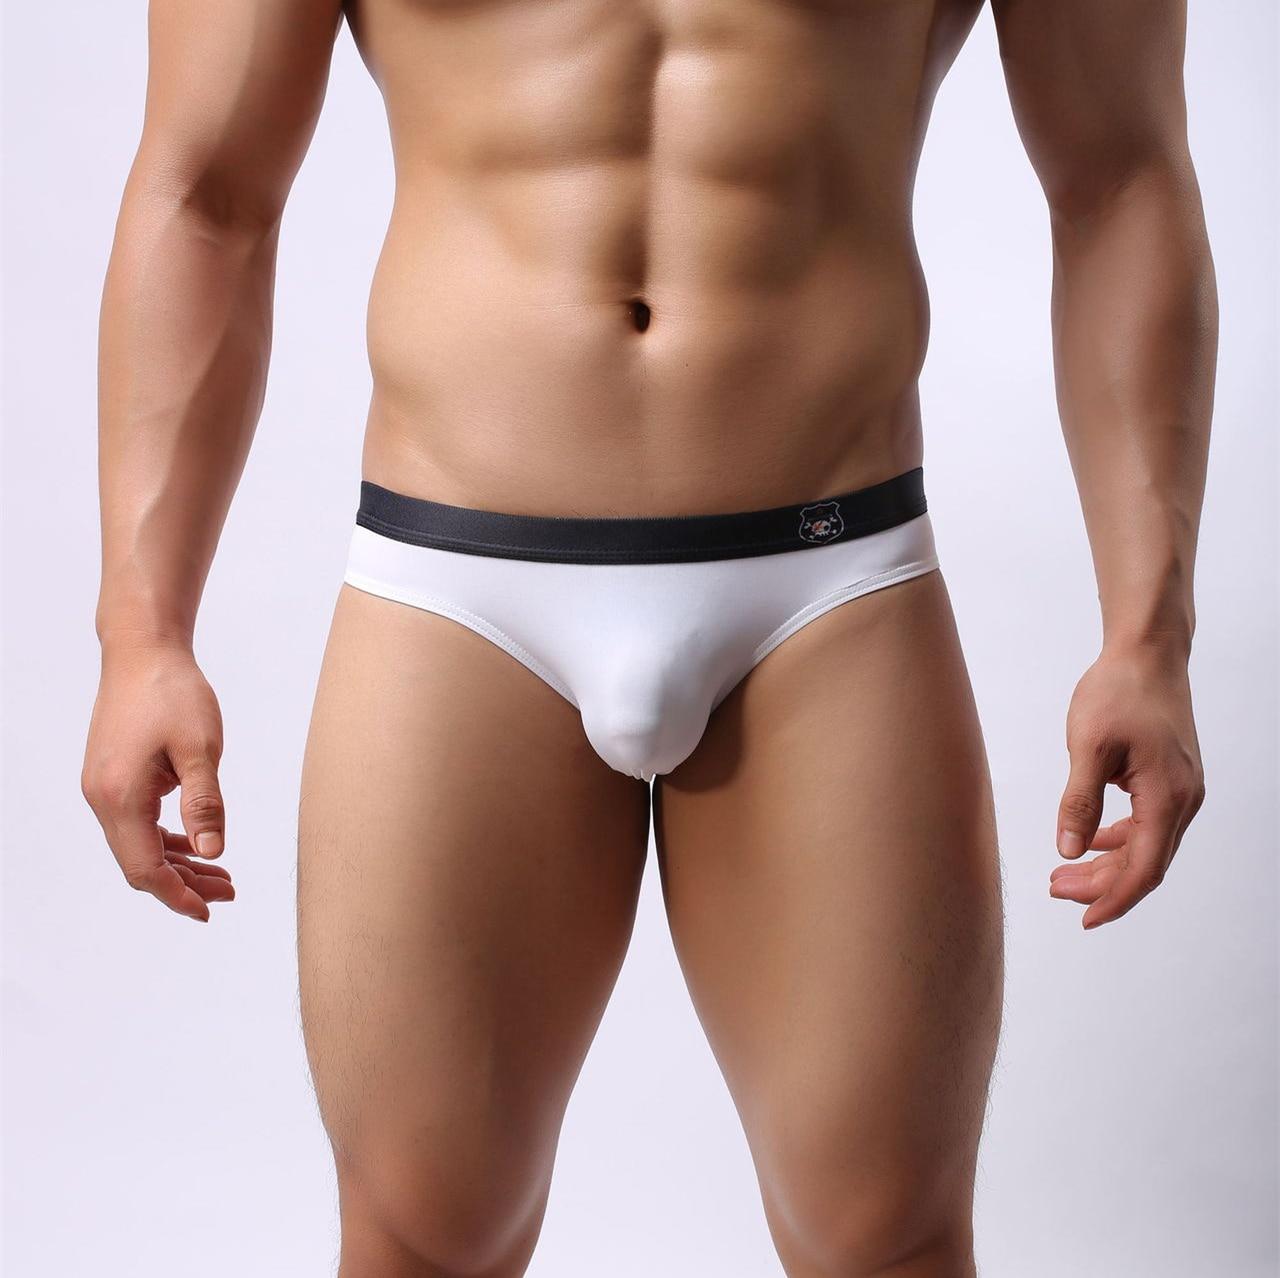 boobs candid nude public